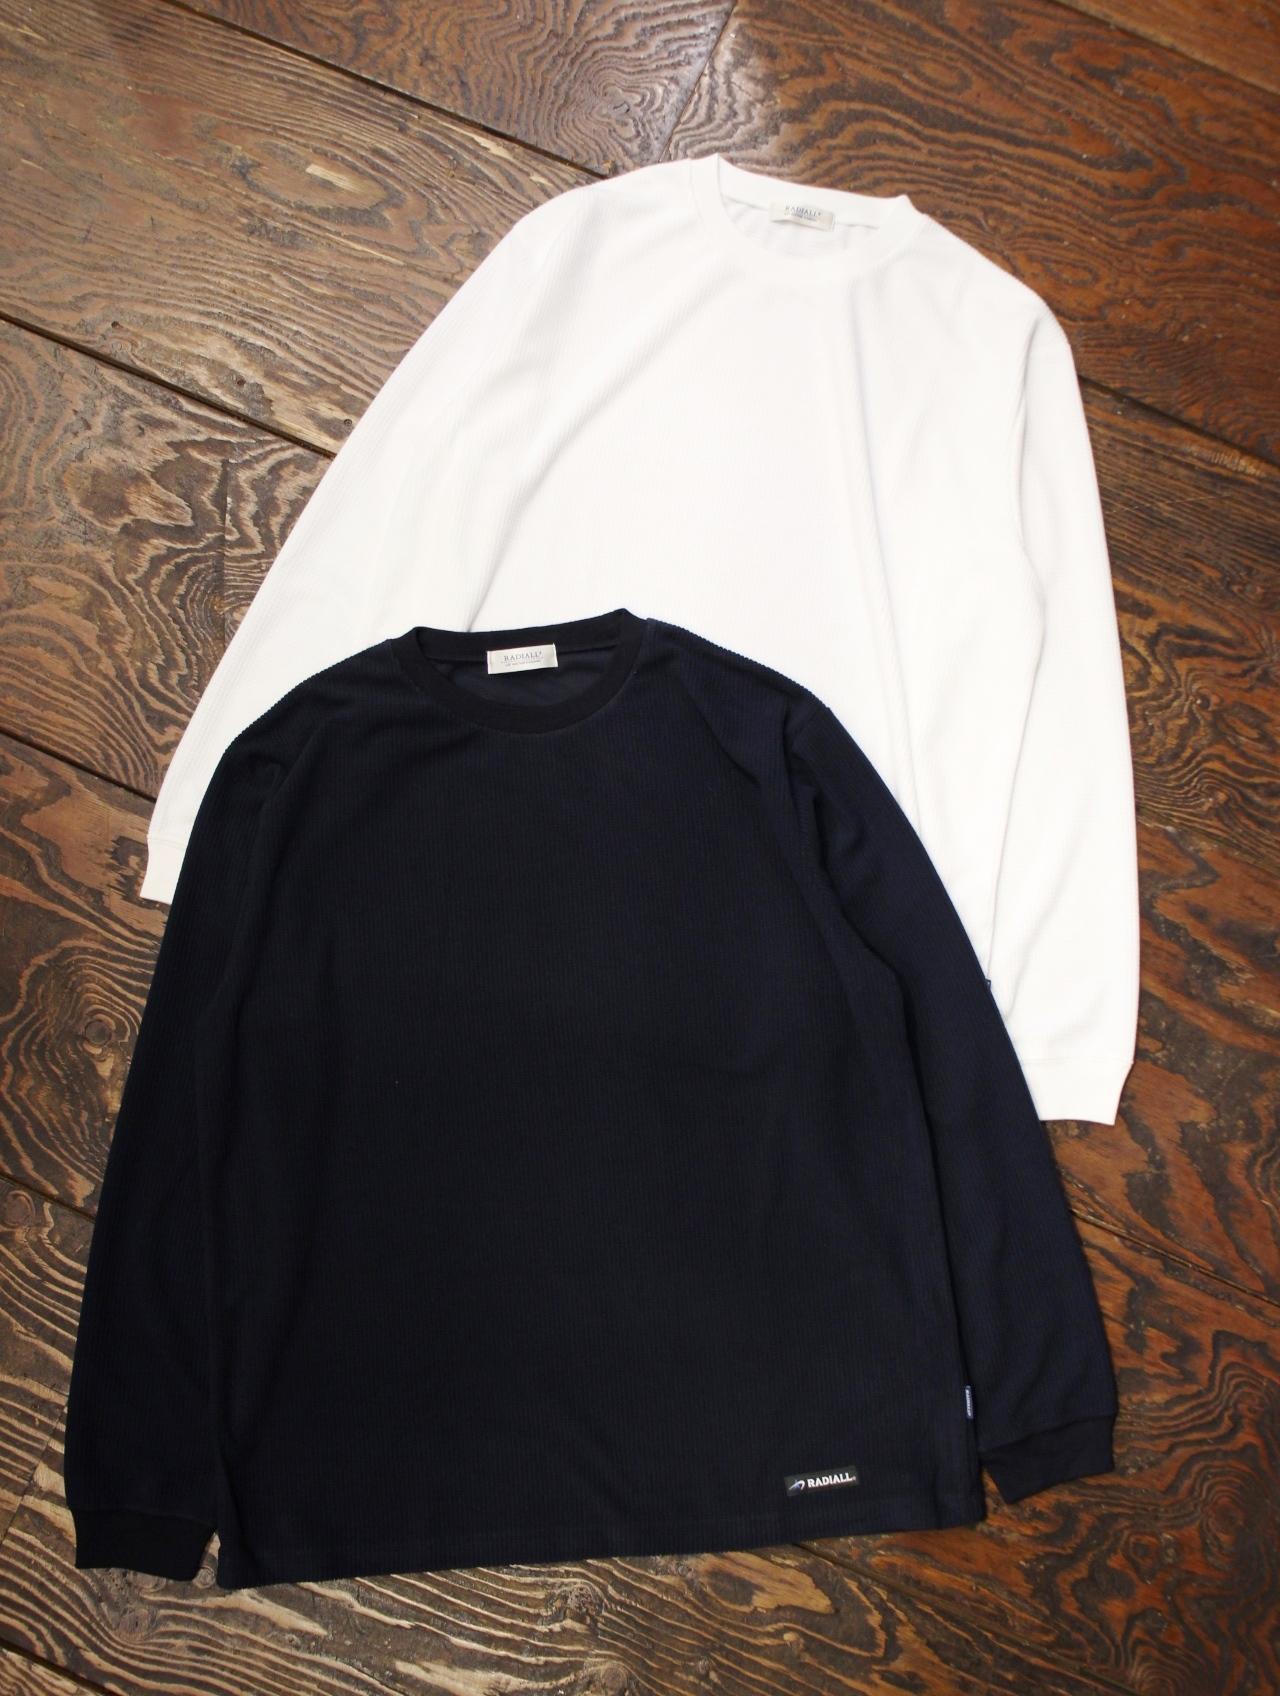 RADIALL  「GRID - CREW NECK T-SHIRT L/S」  ロングスリーブティーシャツ